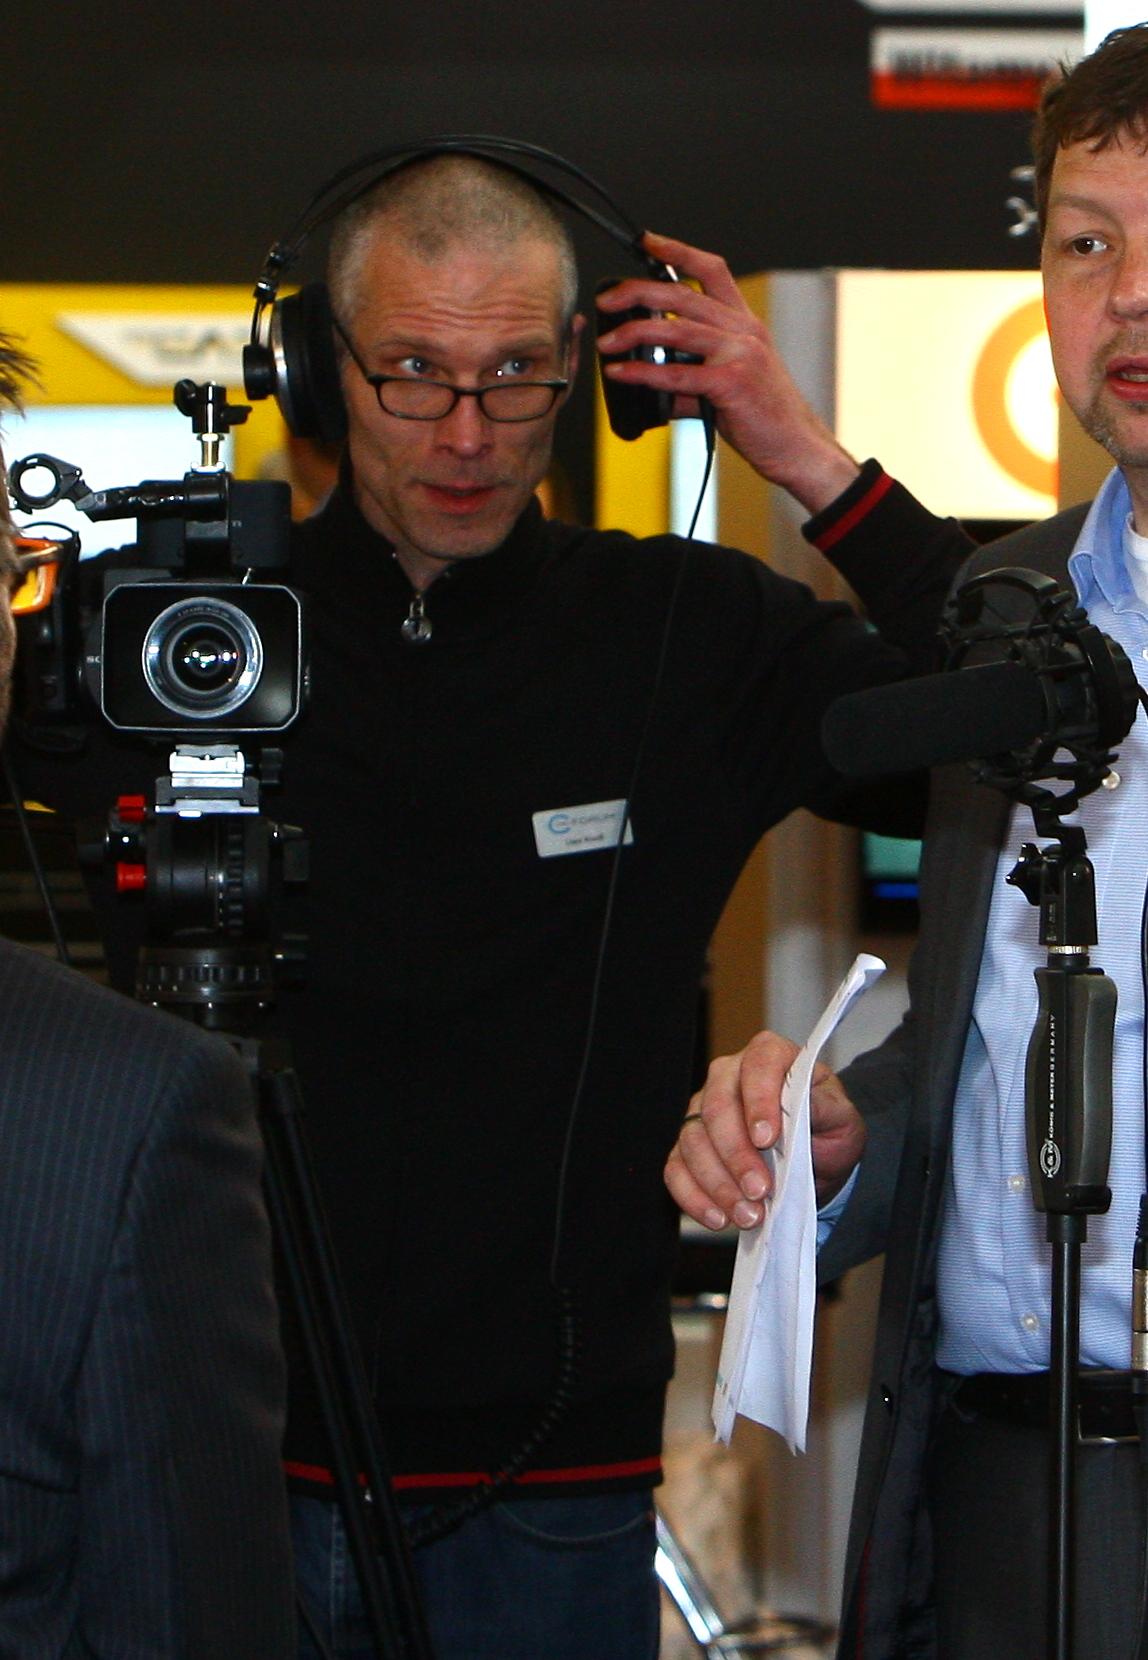 Video Dokumentation